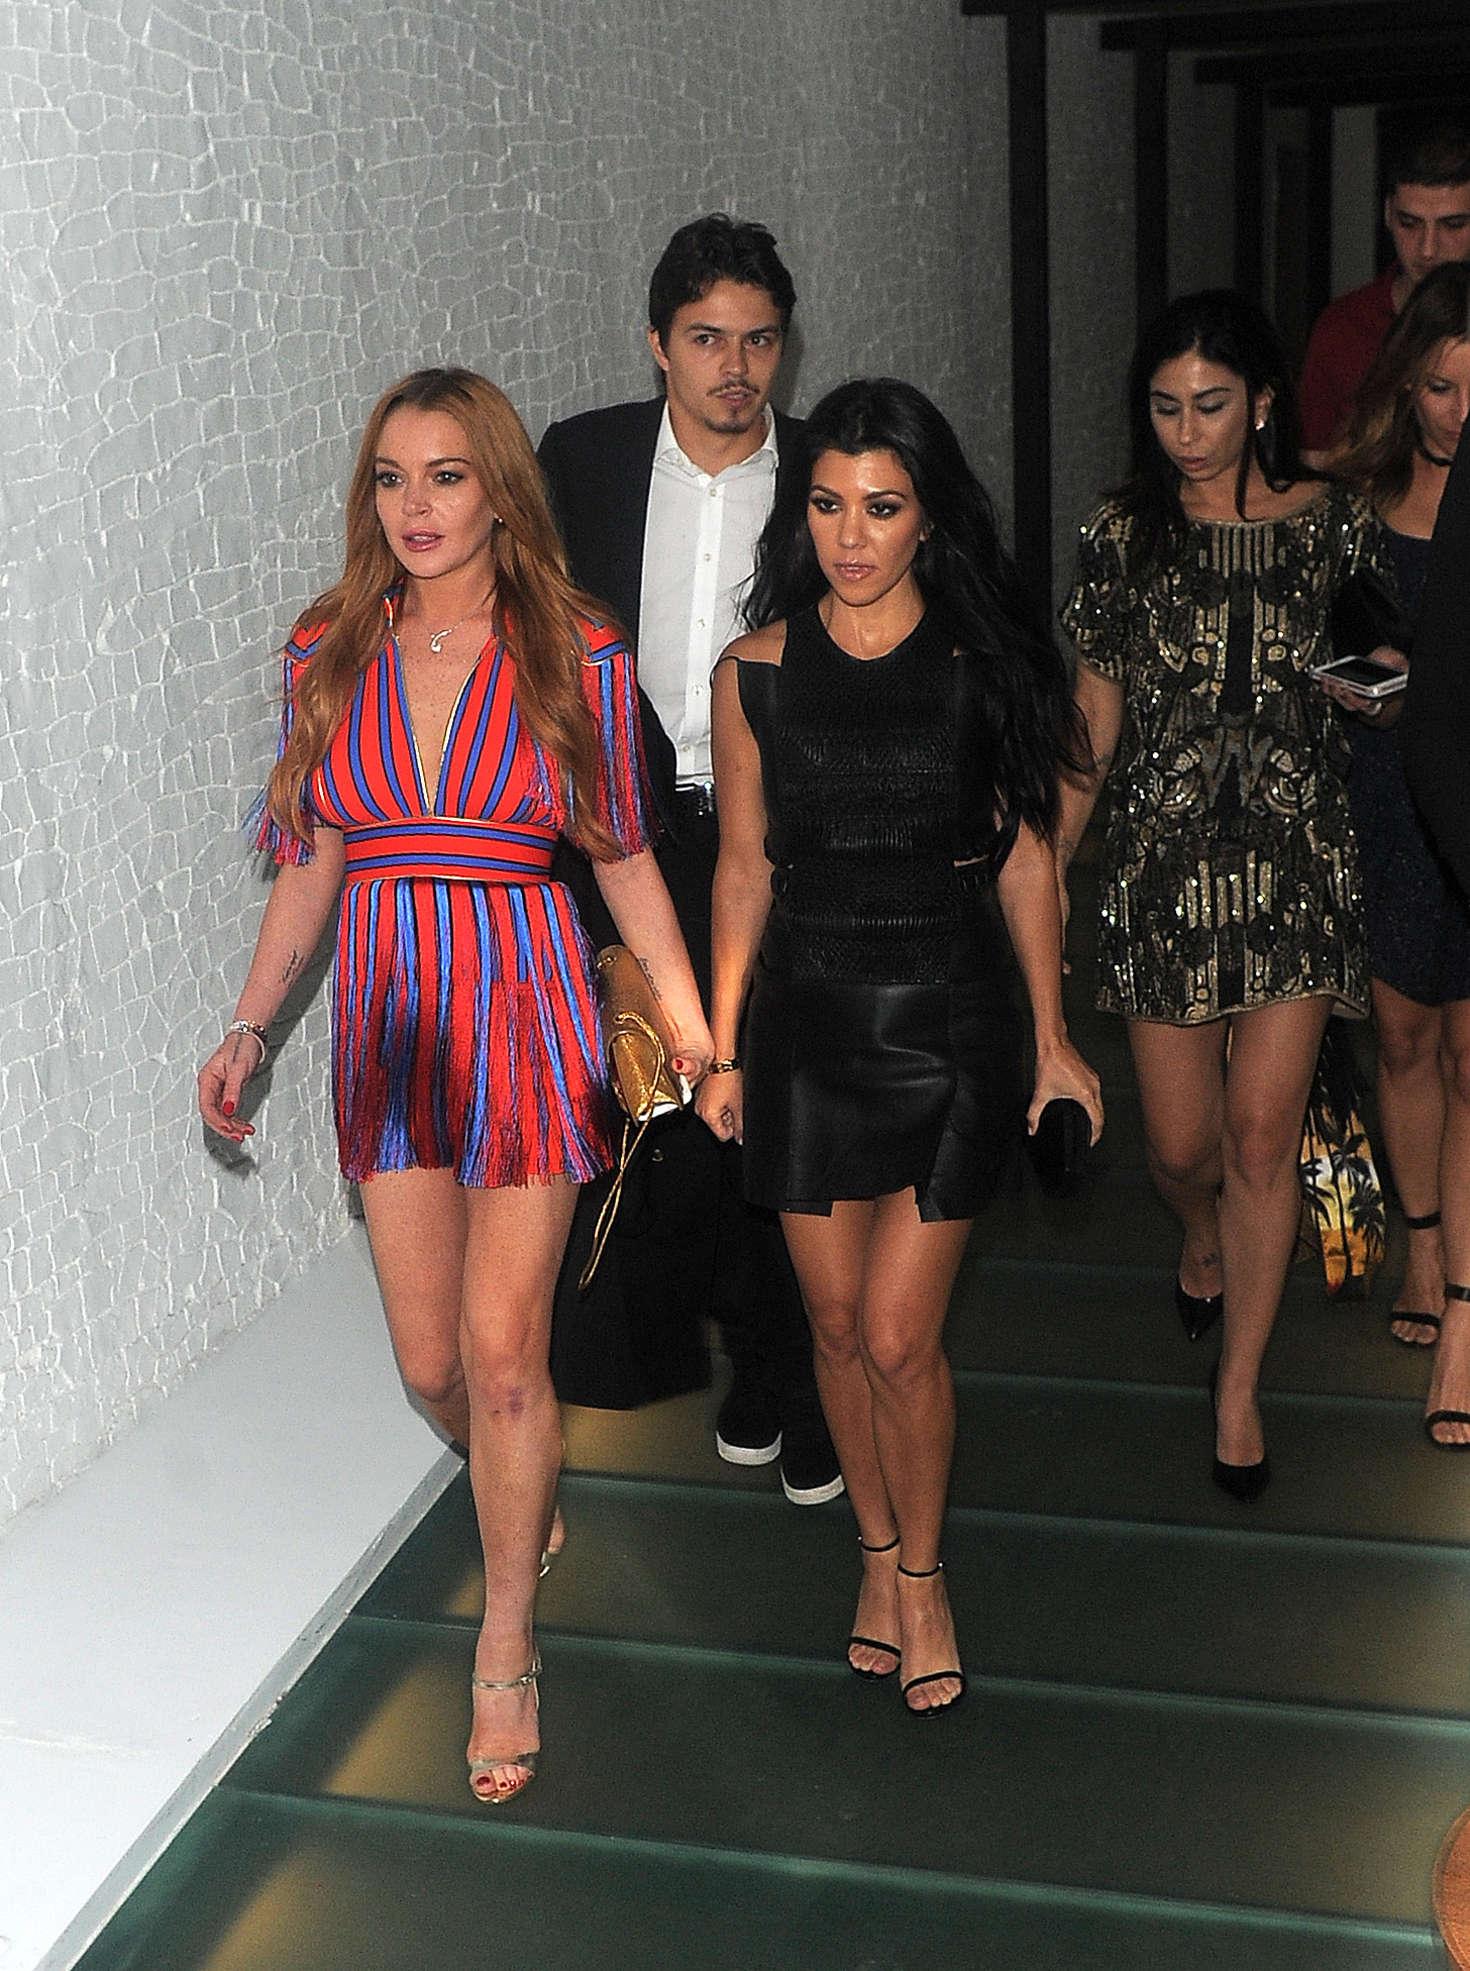 Lindsay Lohan 2016 : Lindsay Lohan and Kourtney Kardashian: Leaving Ours Restaurant -26